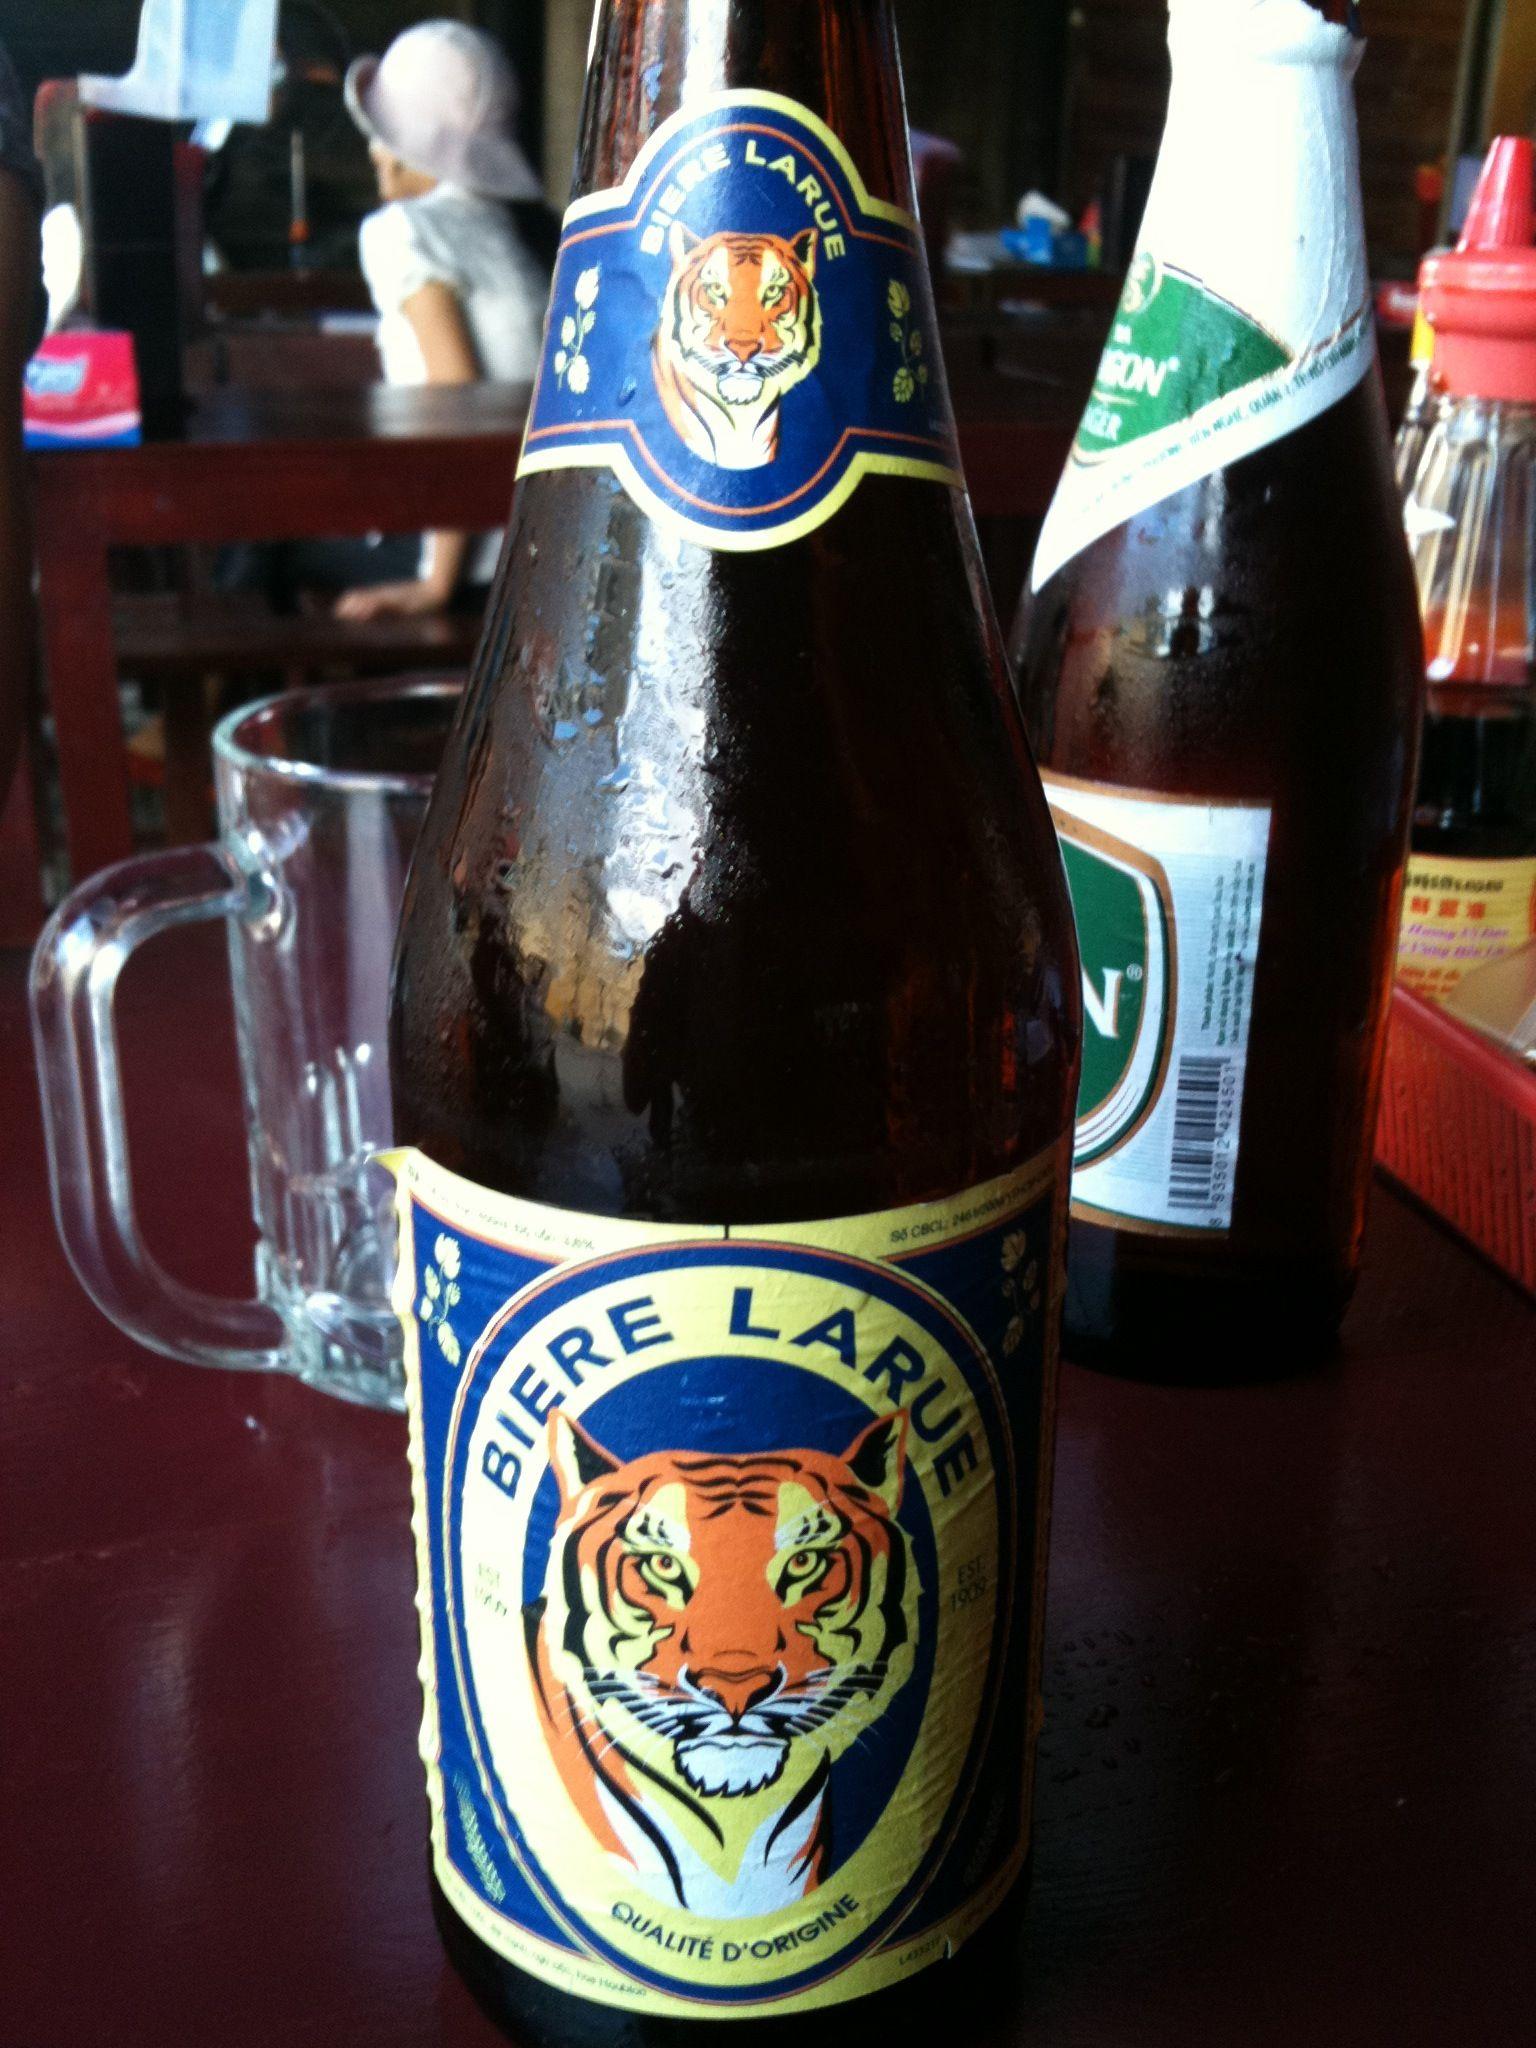 Biere Larue - Hoi An, Vietnam | Beer | Beers of the world